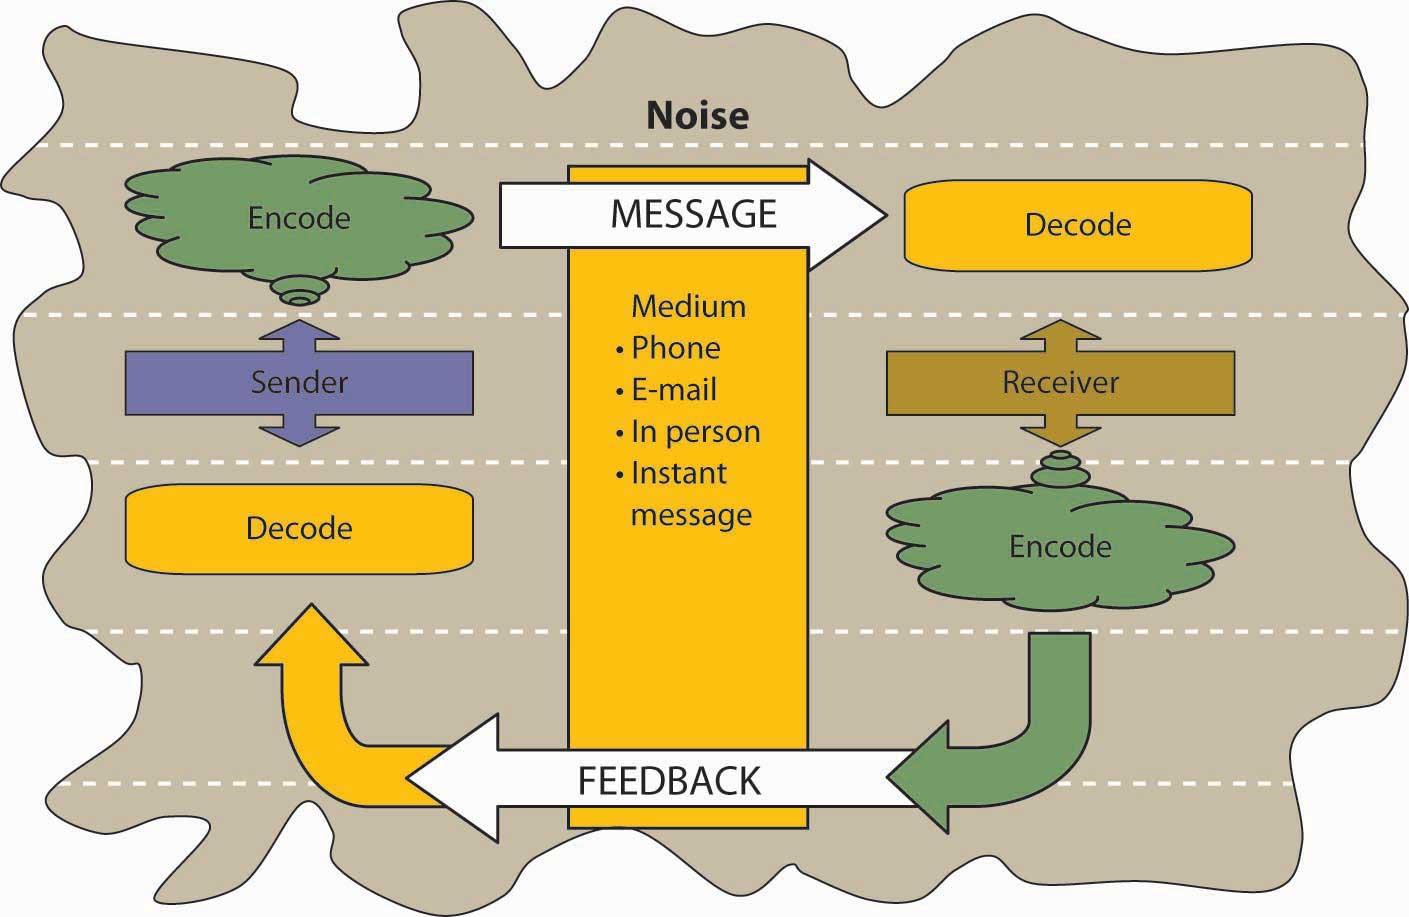 Process Model of Communication